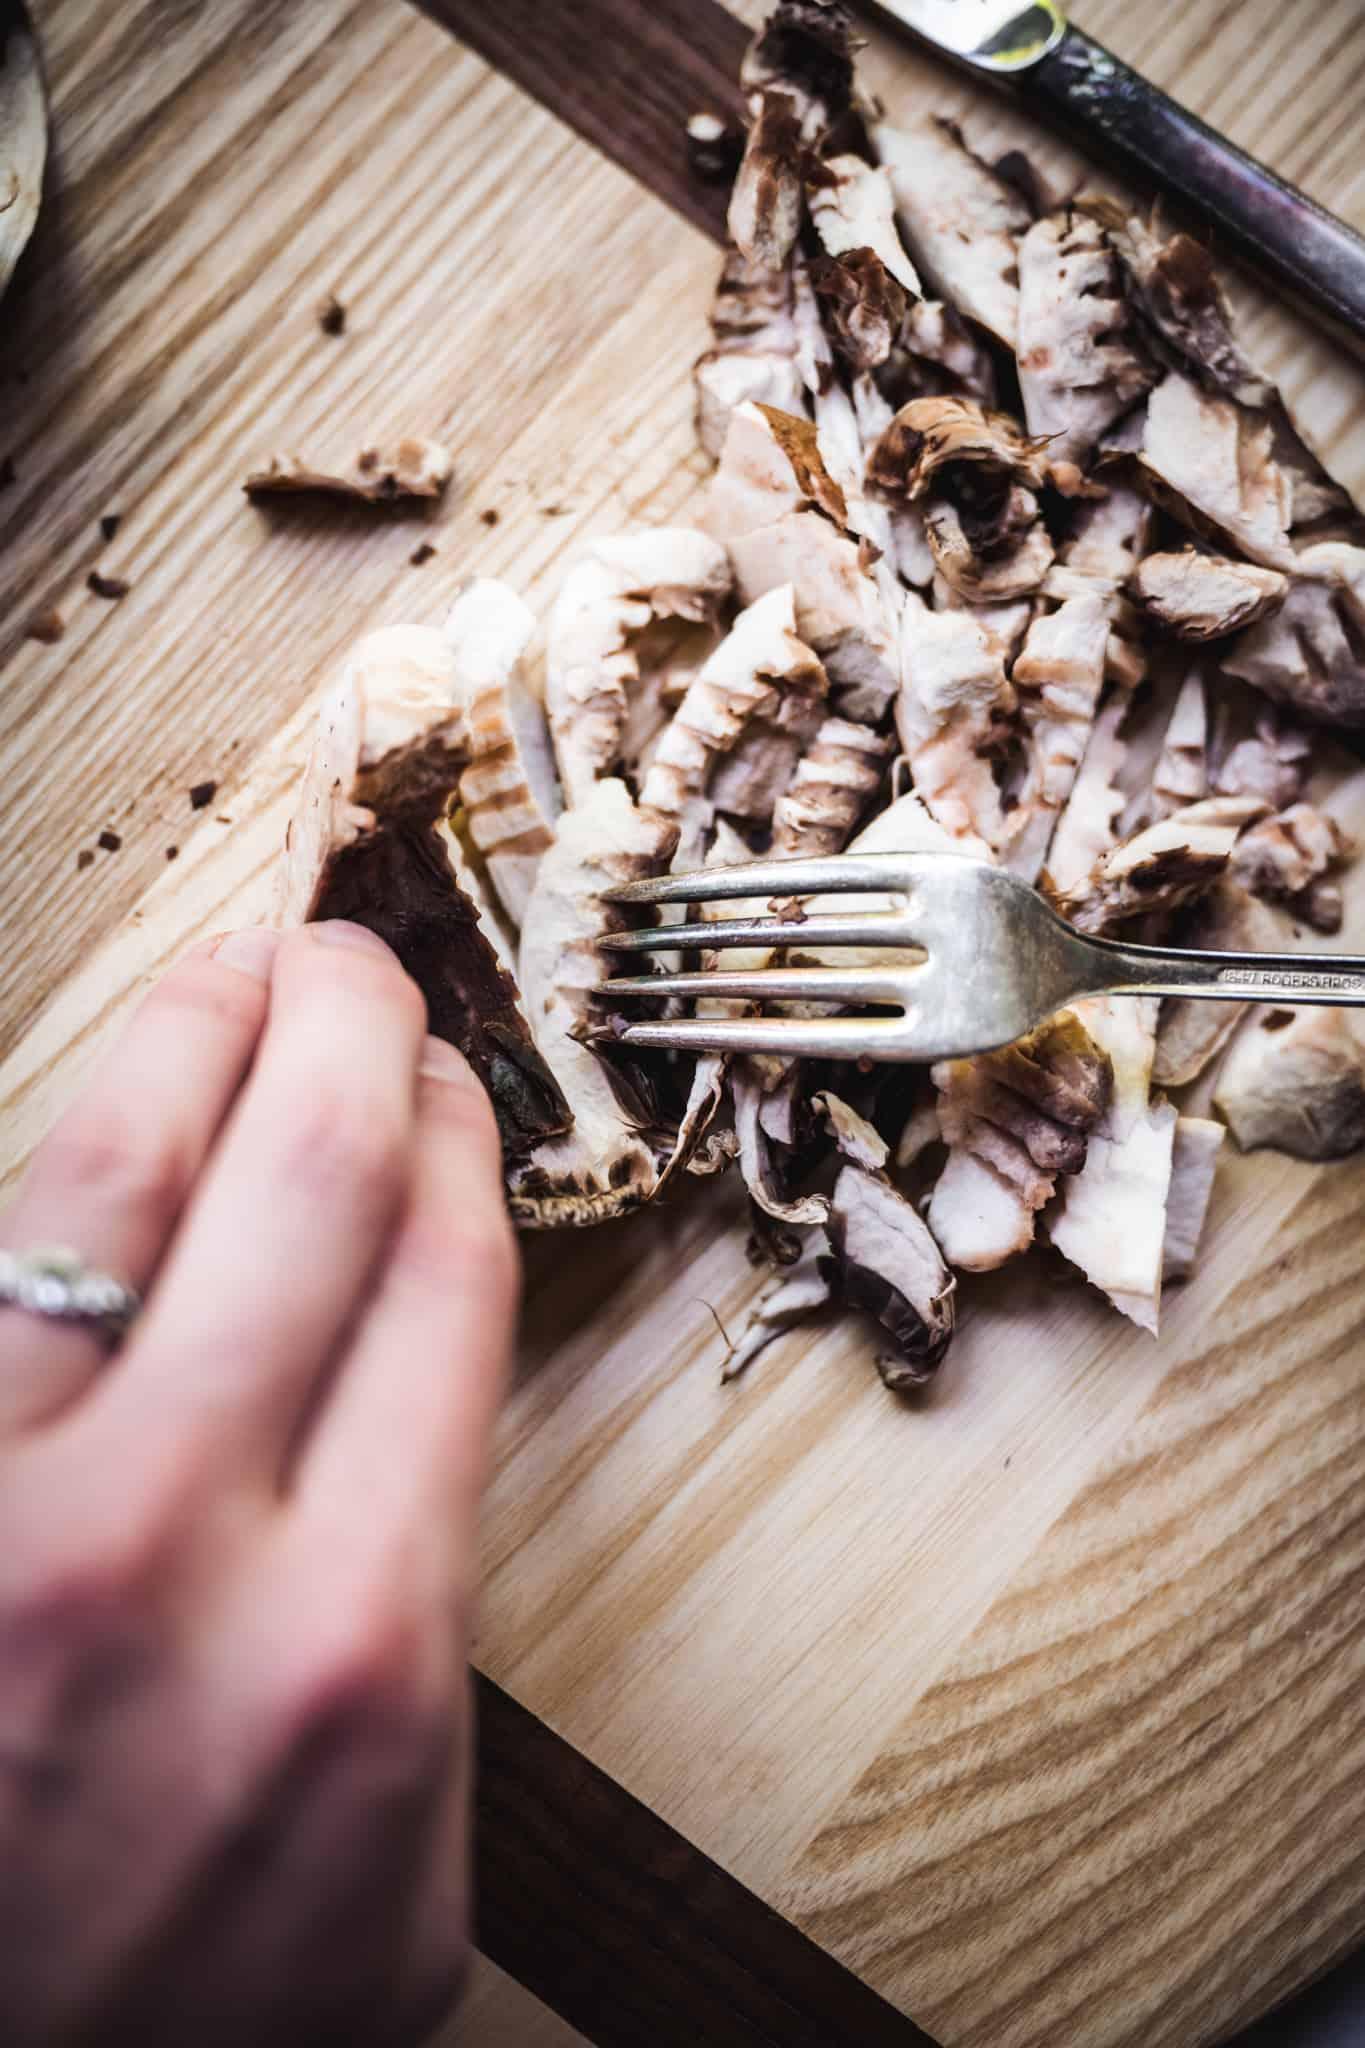 Person shredding portobello mushrooms